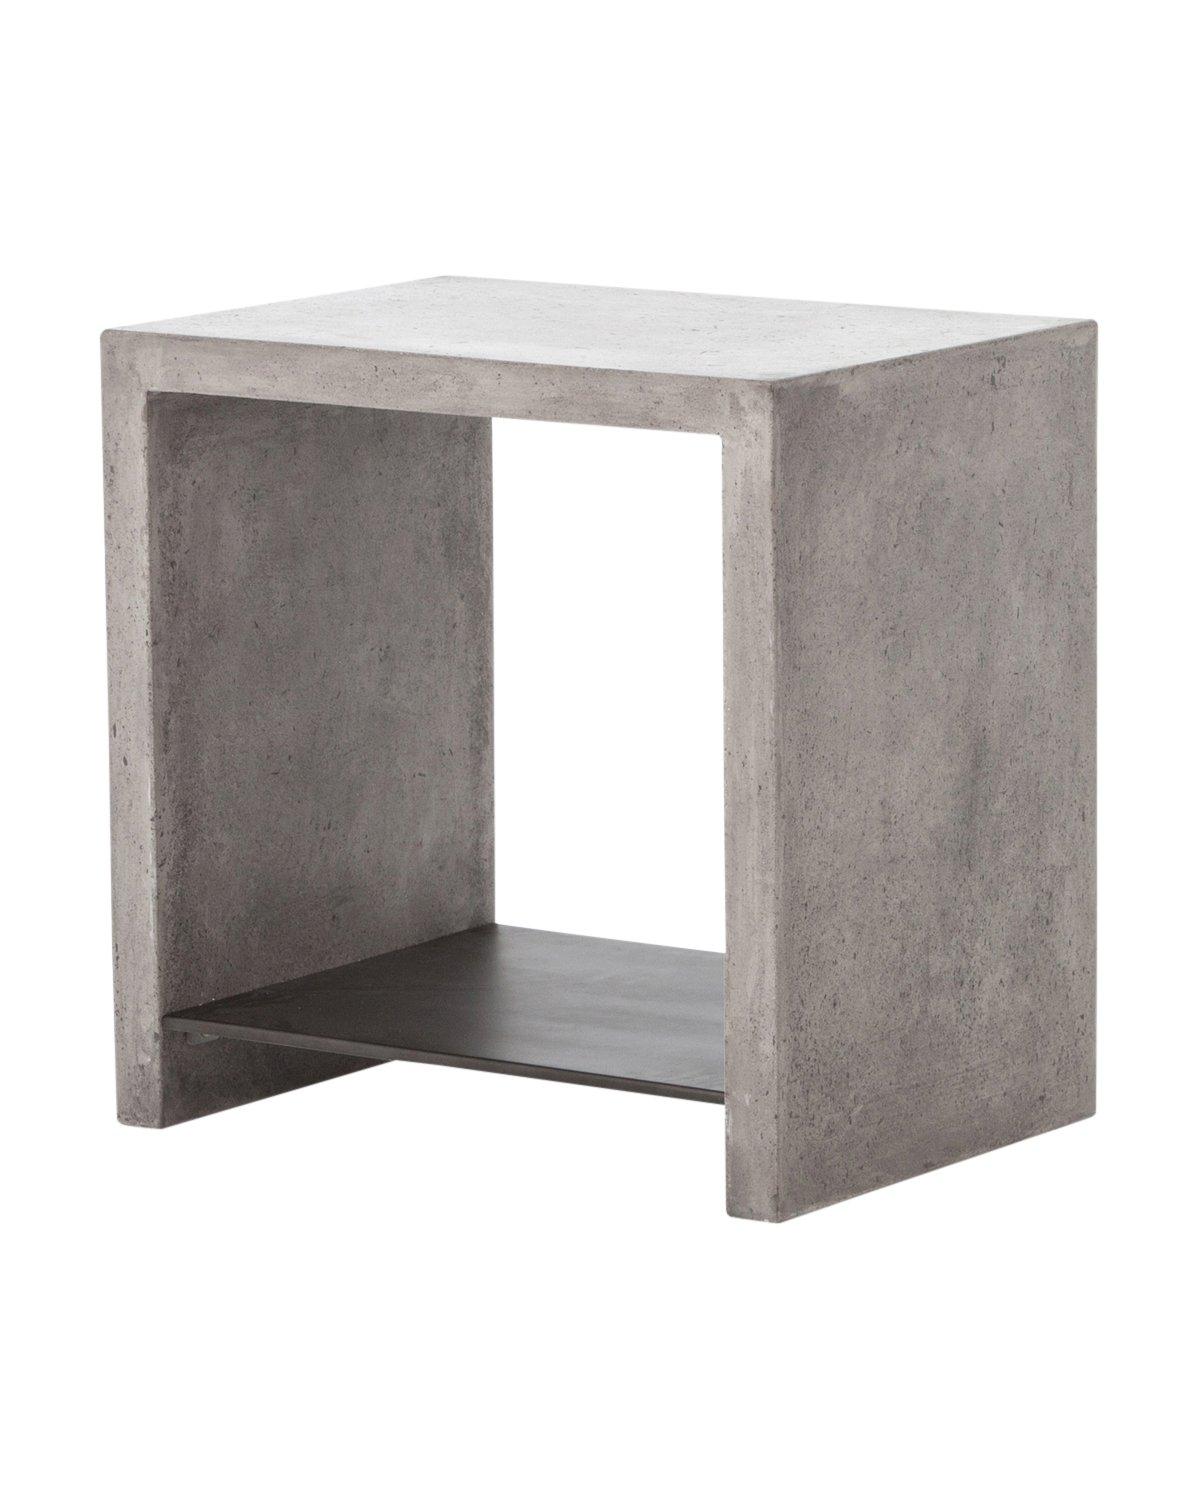 FRANCO SIDE TABLE, DARK GRAY